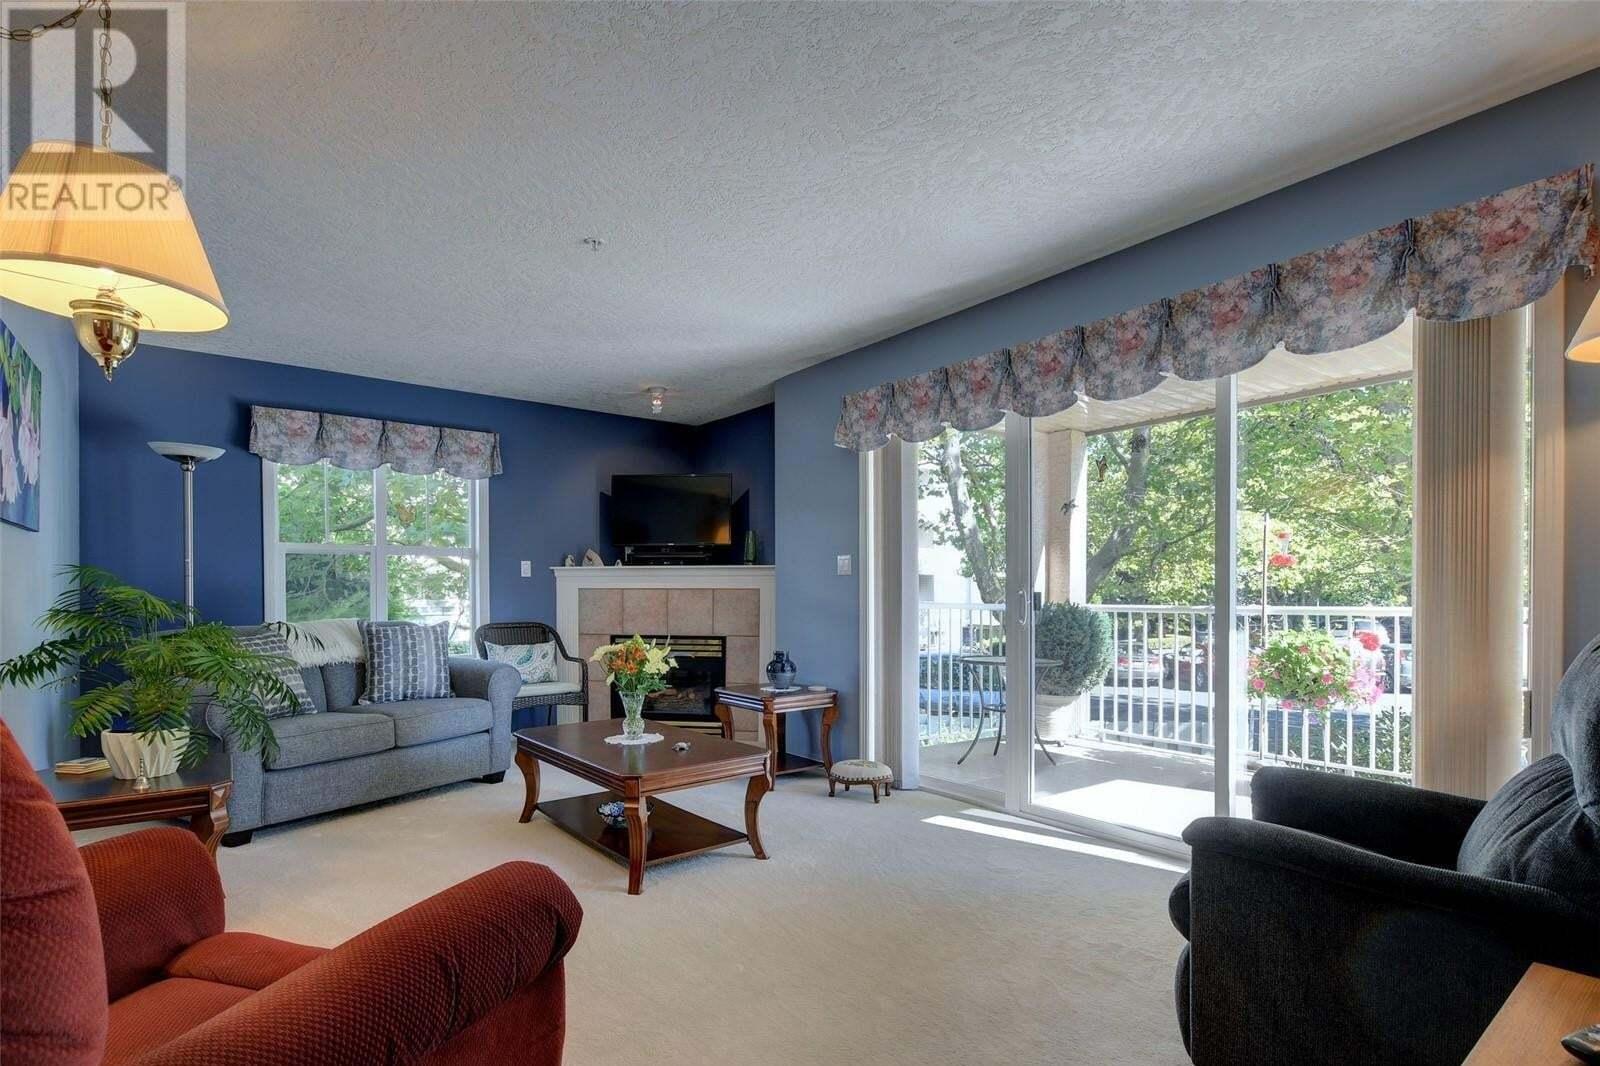 Condo for sale at 1240 Verdier Ave Unit 203 Central Saanich British Columbia - MLS: 853732